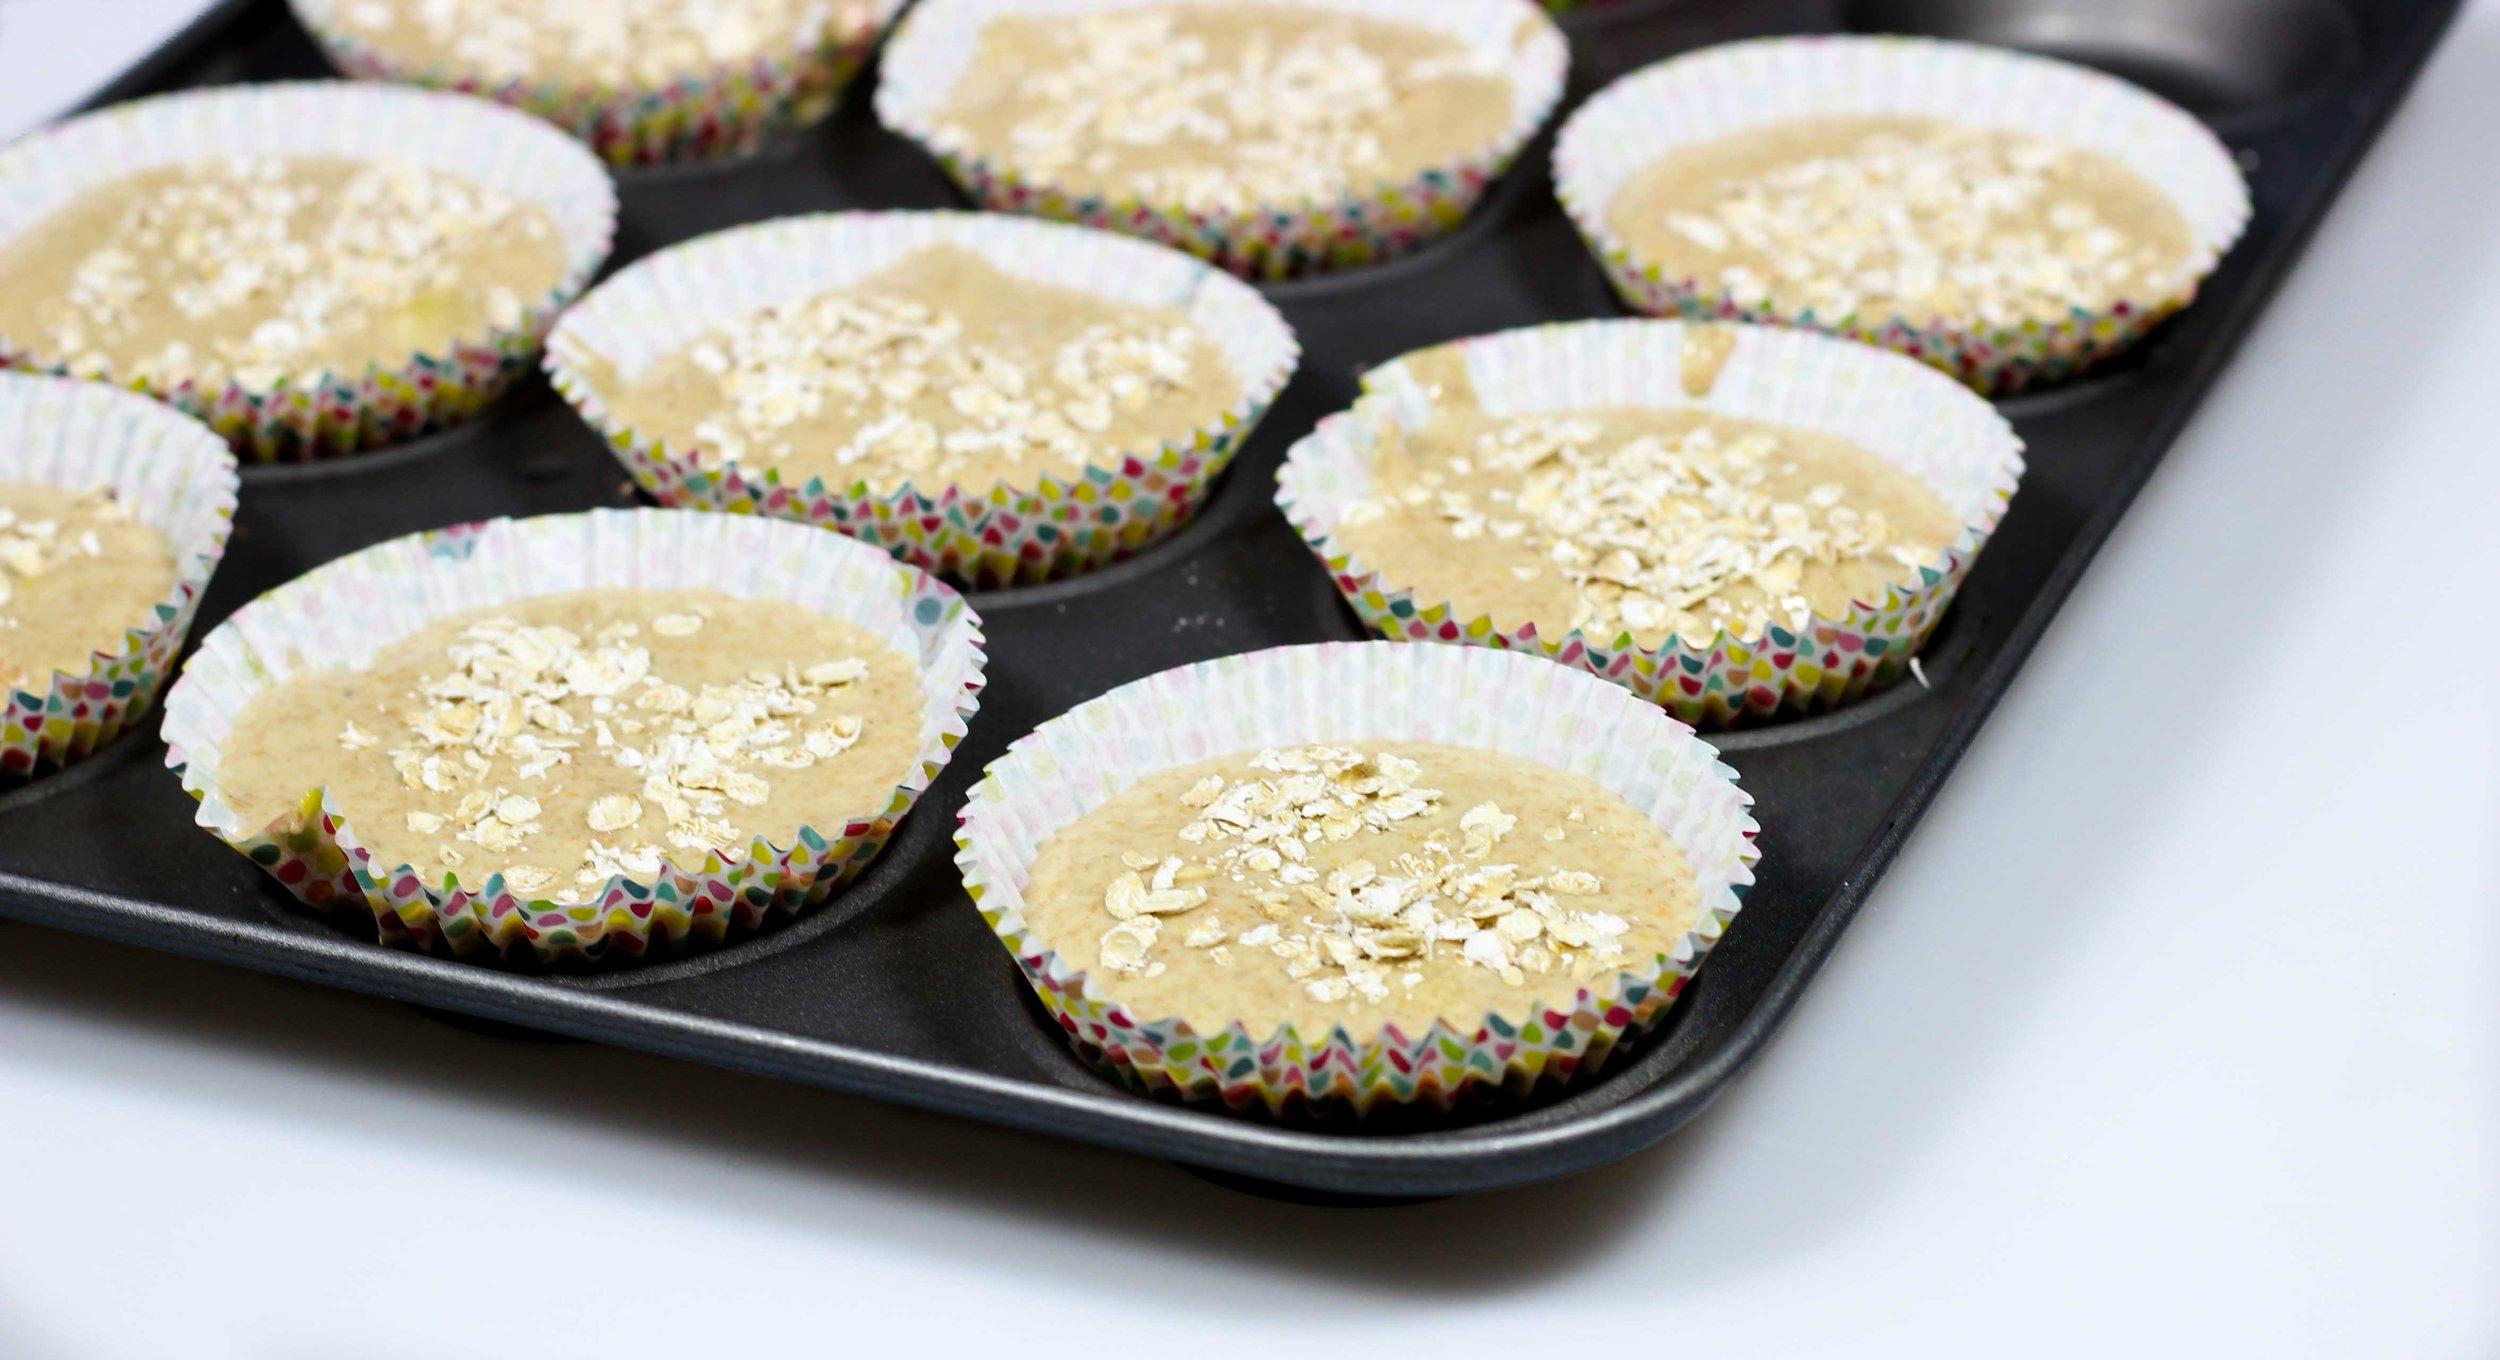 Homemade Recipe Whole Wheat Muffins